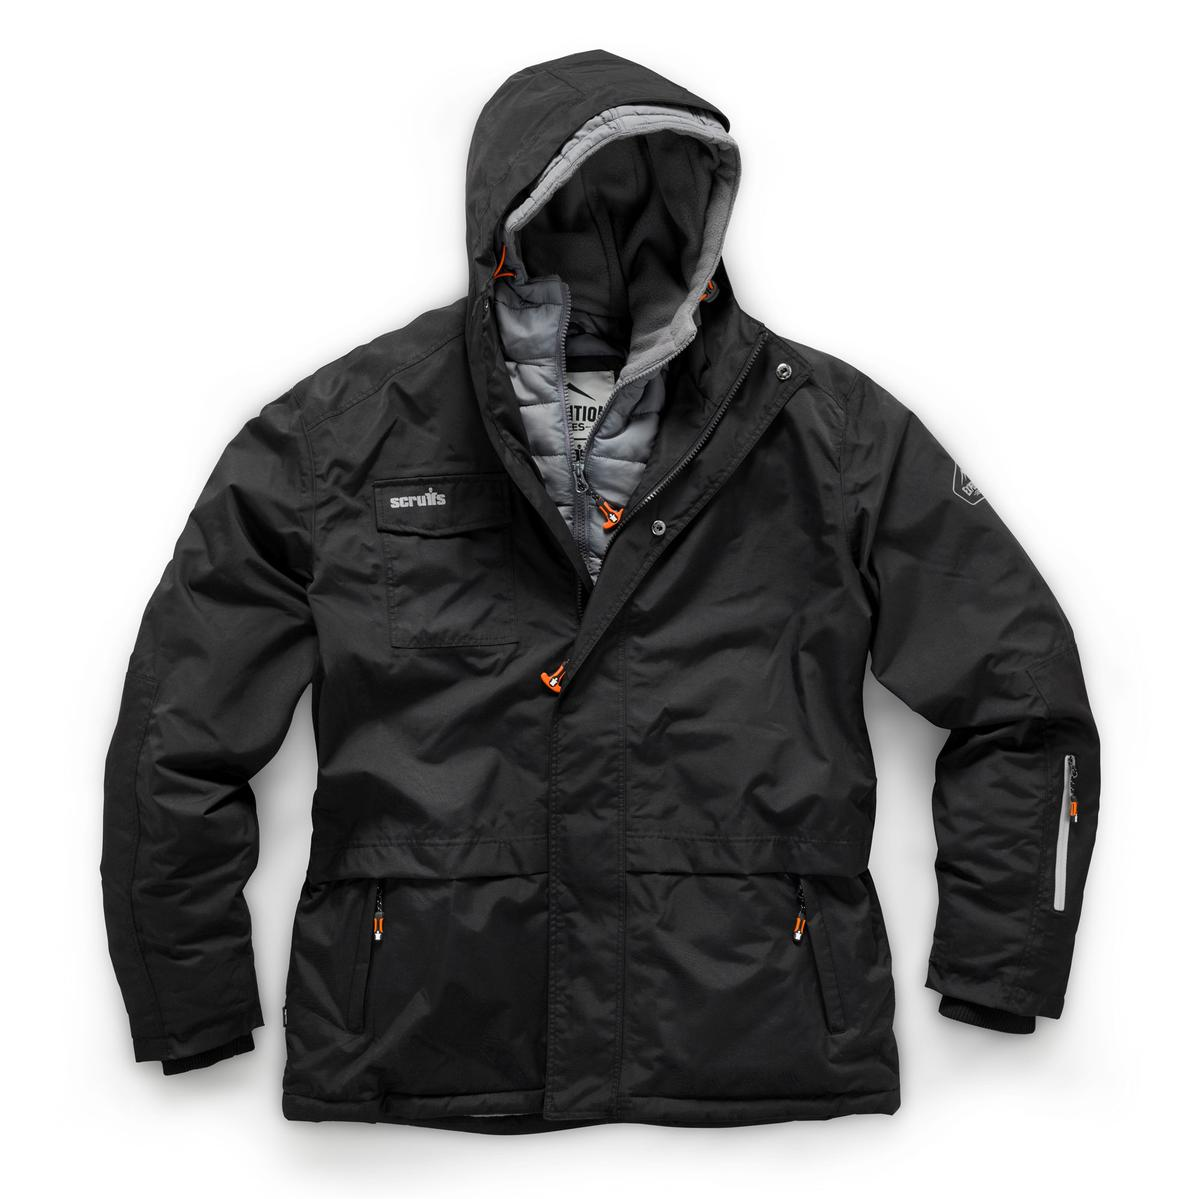 Expedition Double Zip Jacket